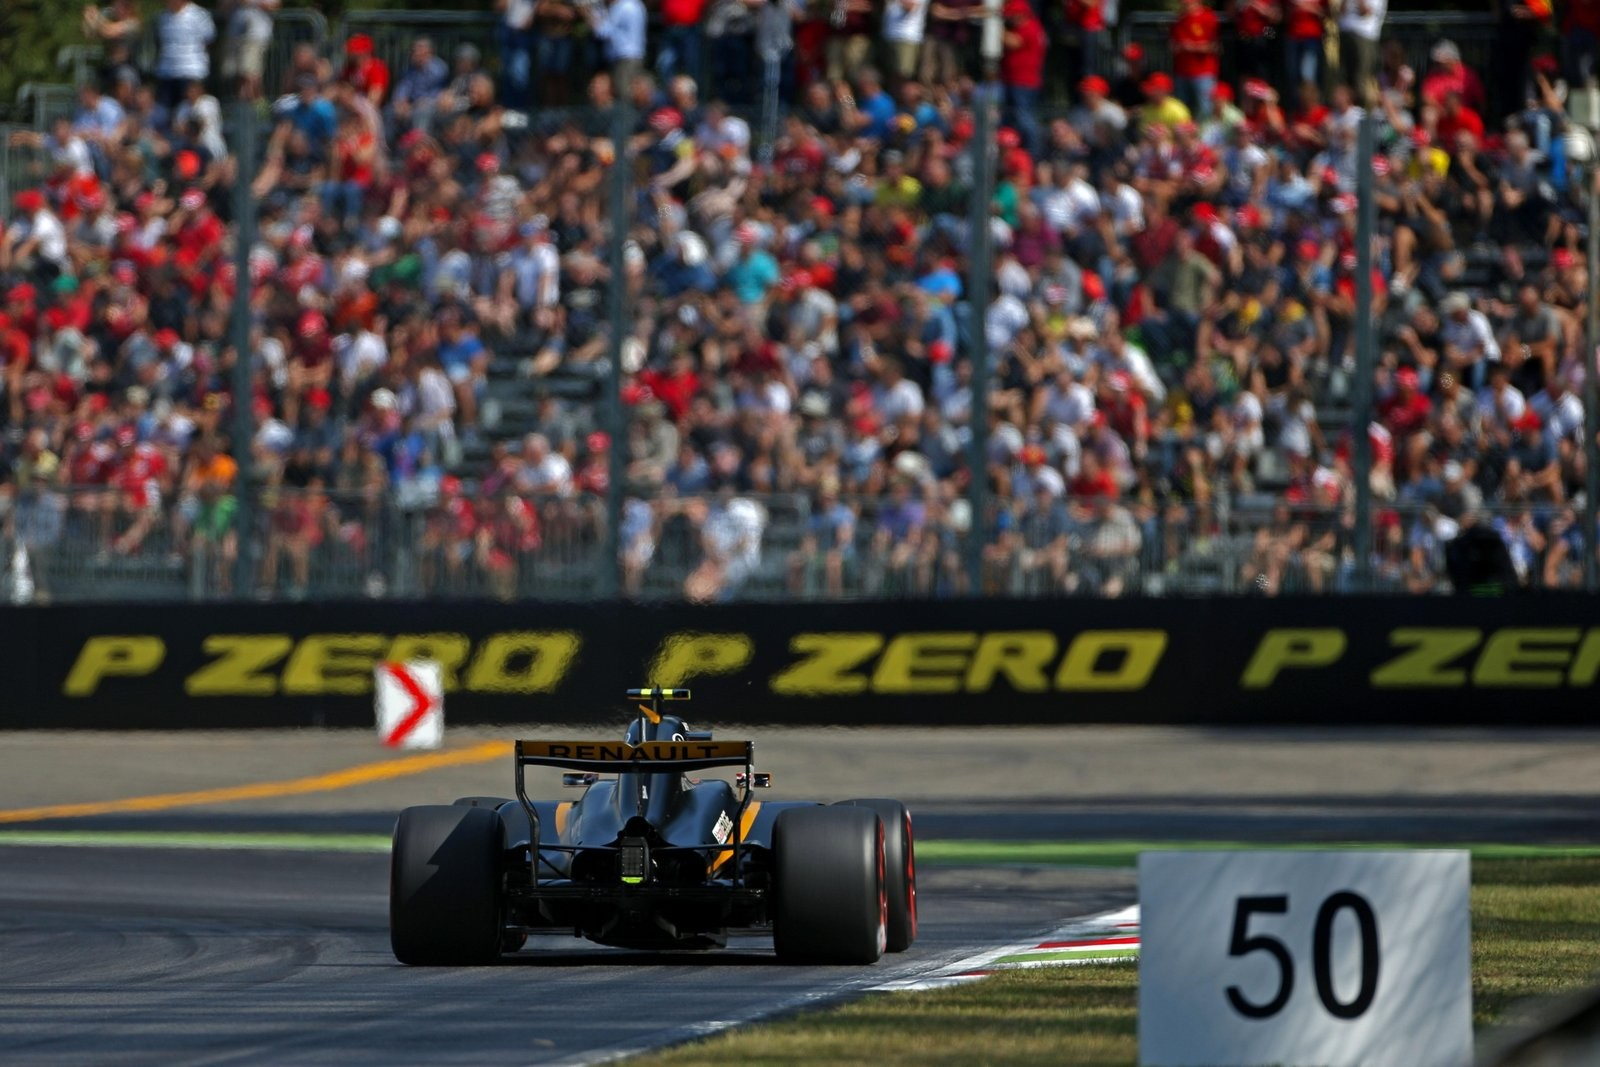 A SUPER VIP F1 EXPERIENCE